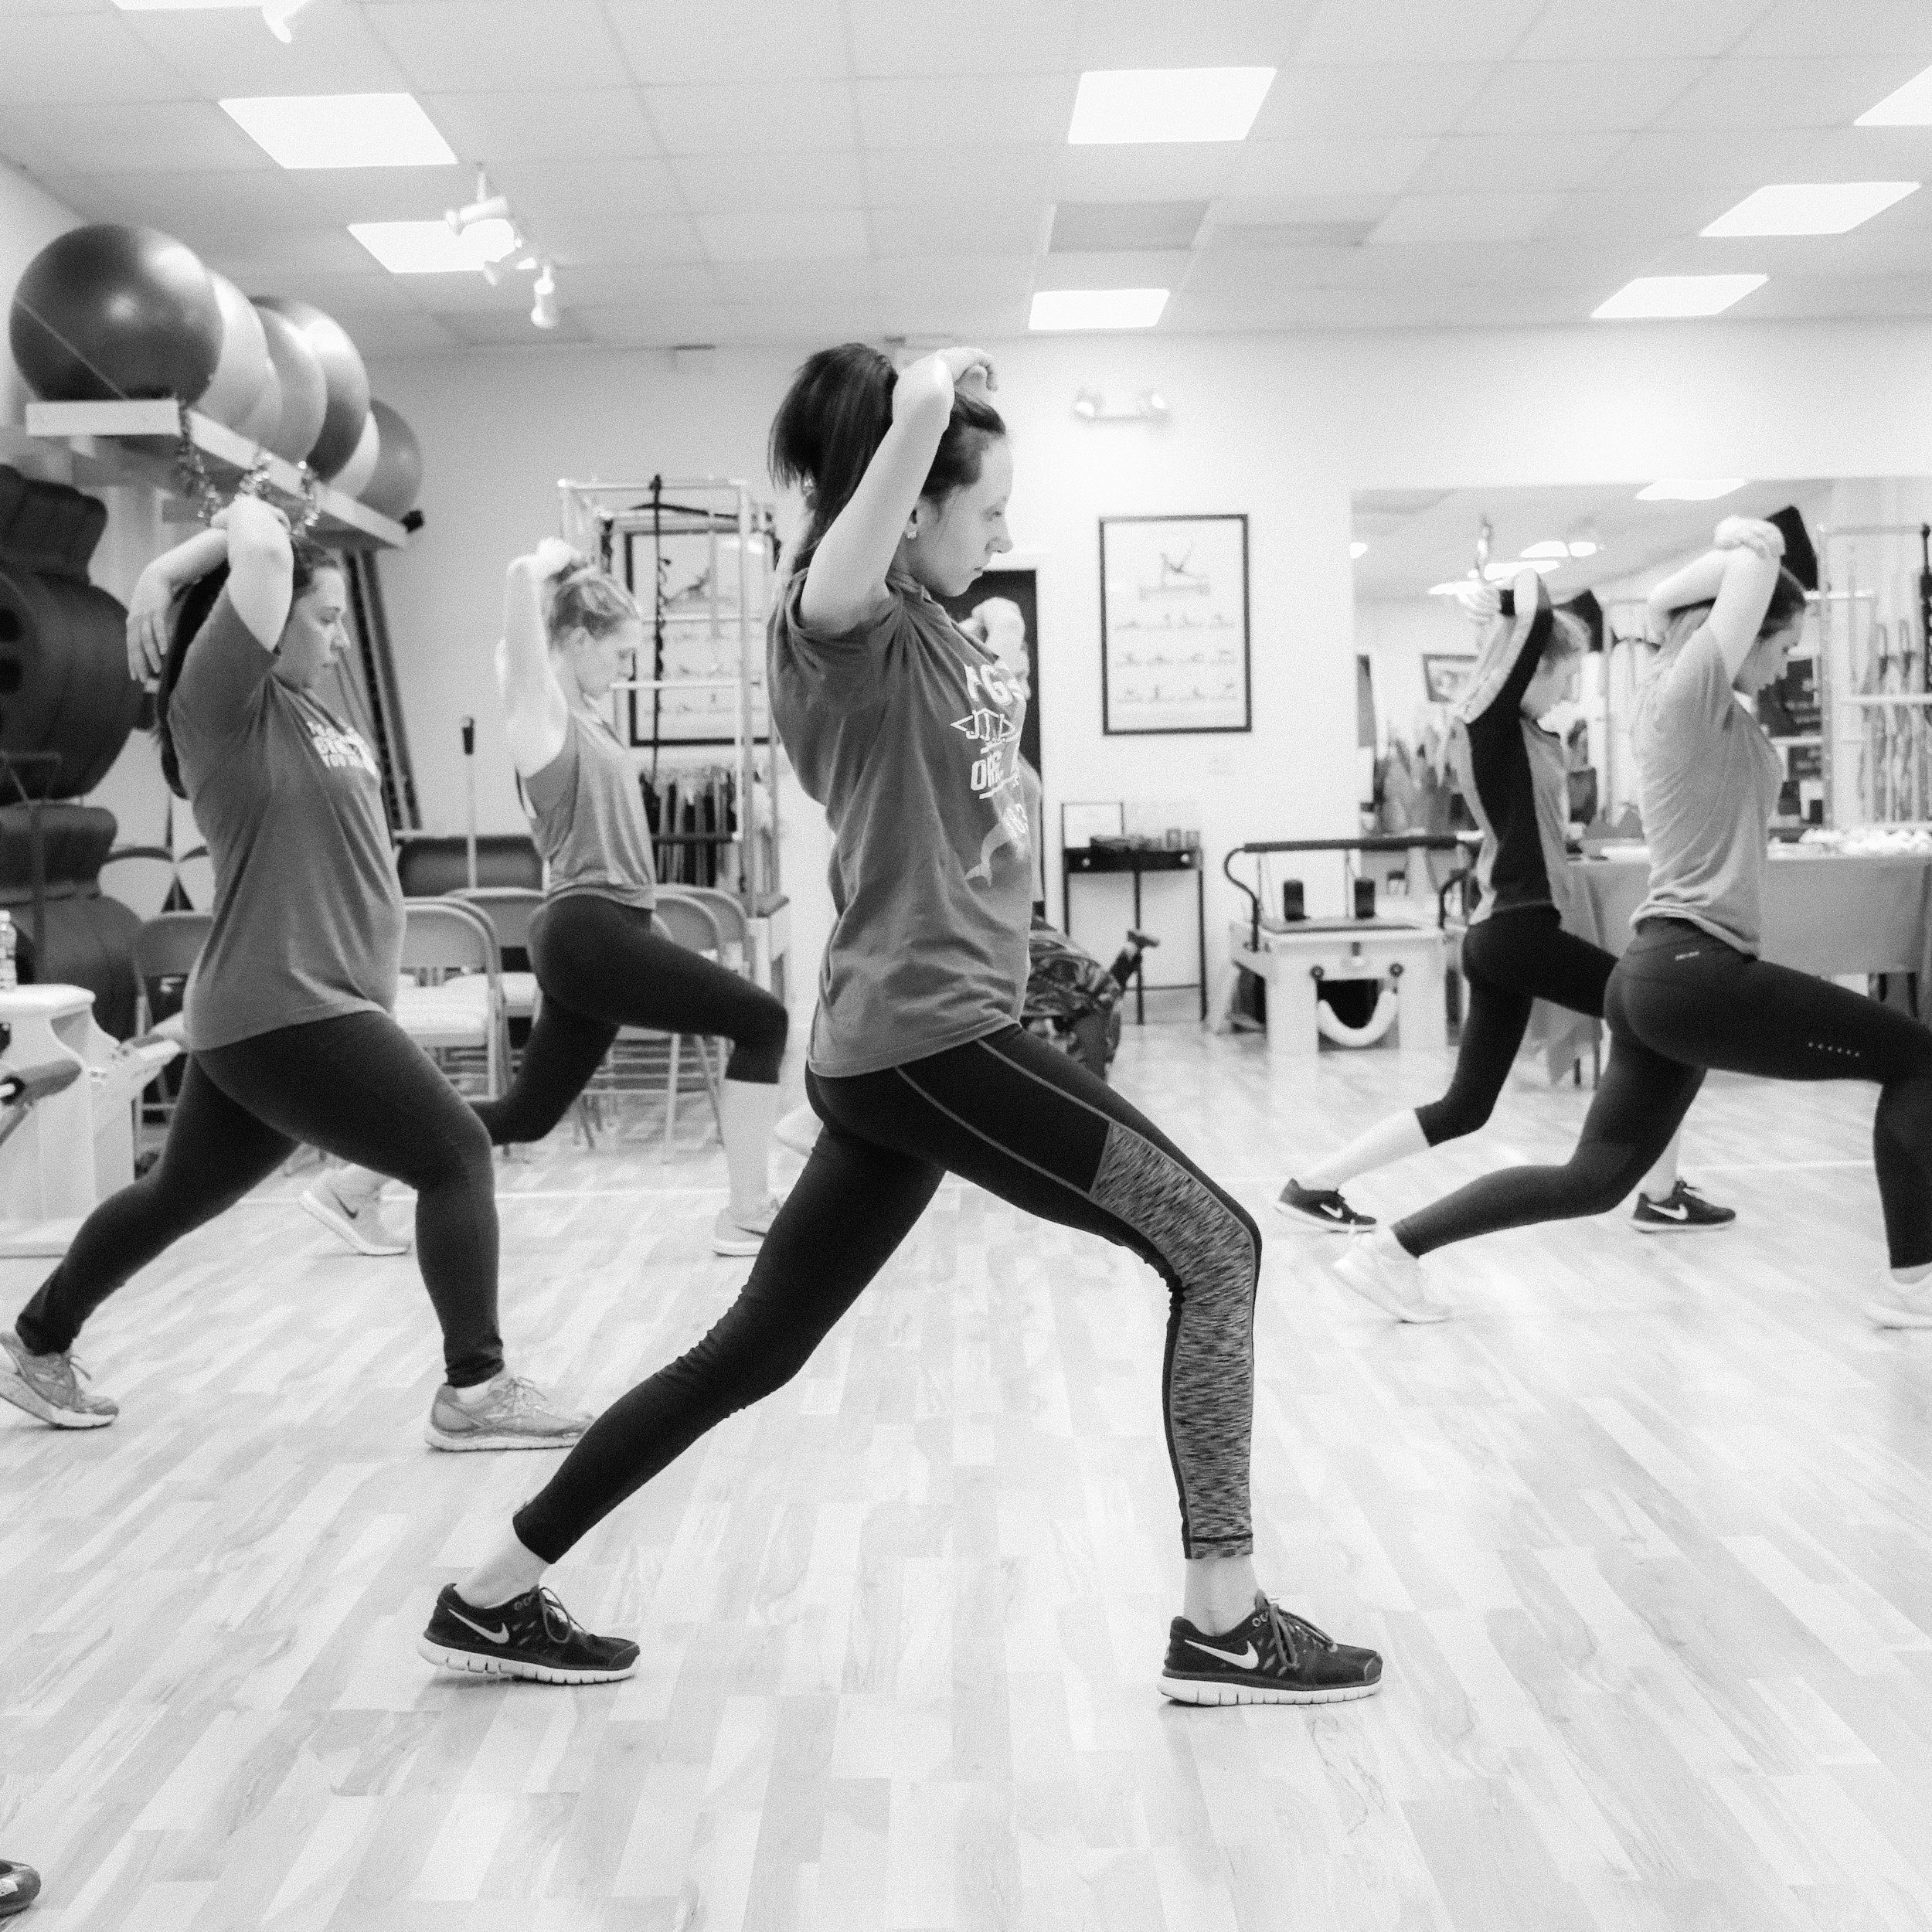 Group Fitness Classes - Yoga, Barre, Pilates Mat, P90X Live!, TurboKick Live!, PiYo Live, & Core de Force Live!10 class pass - $10020 class pass - $160Drop In - $12